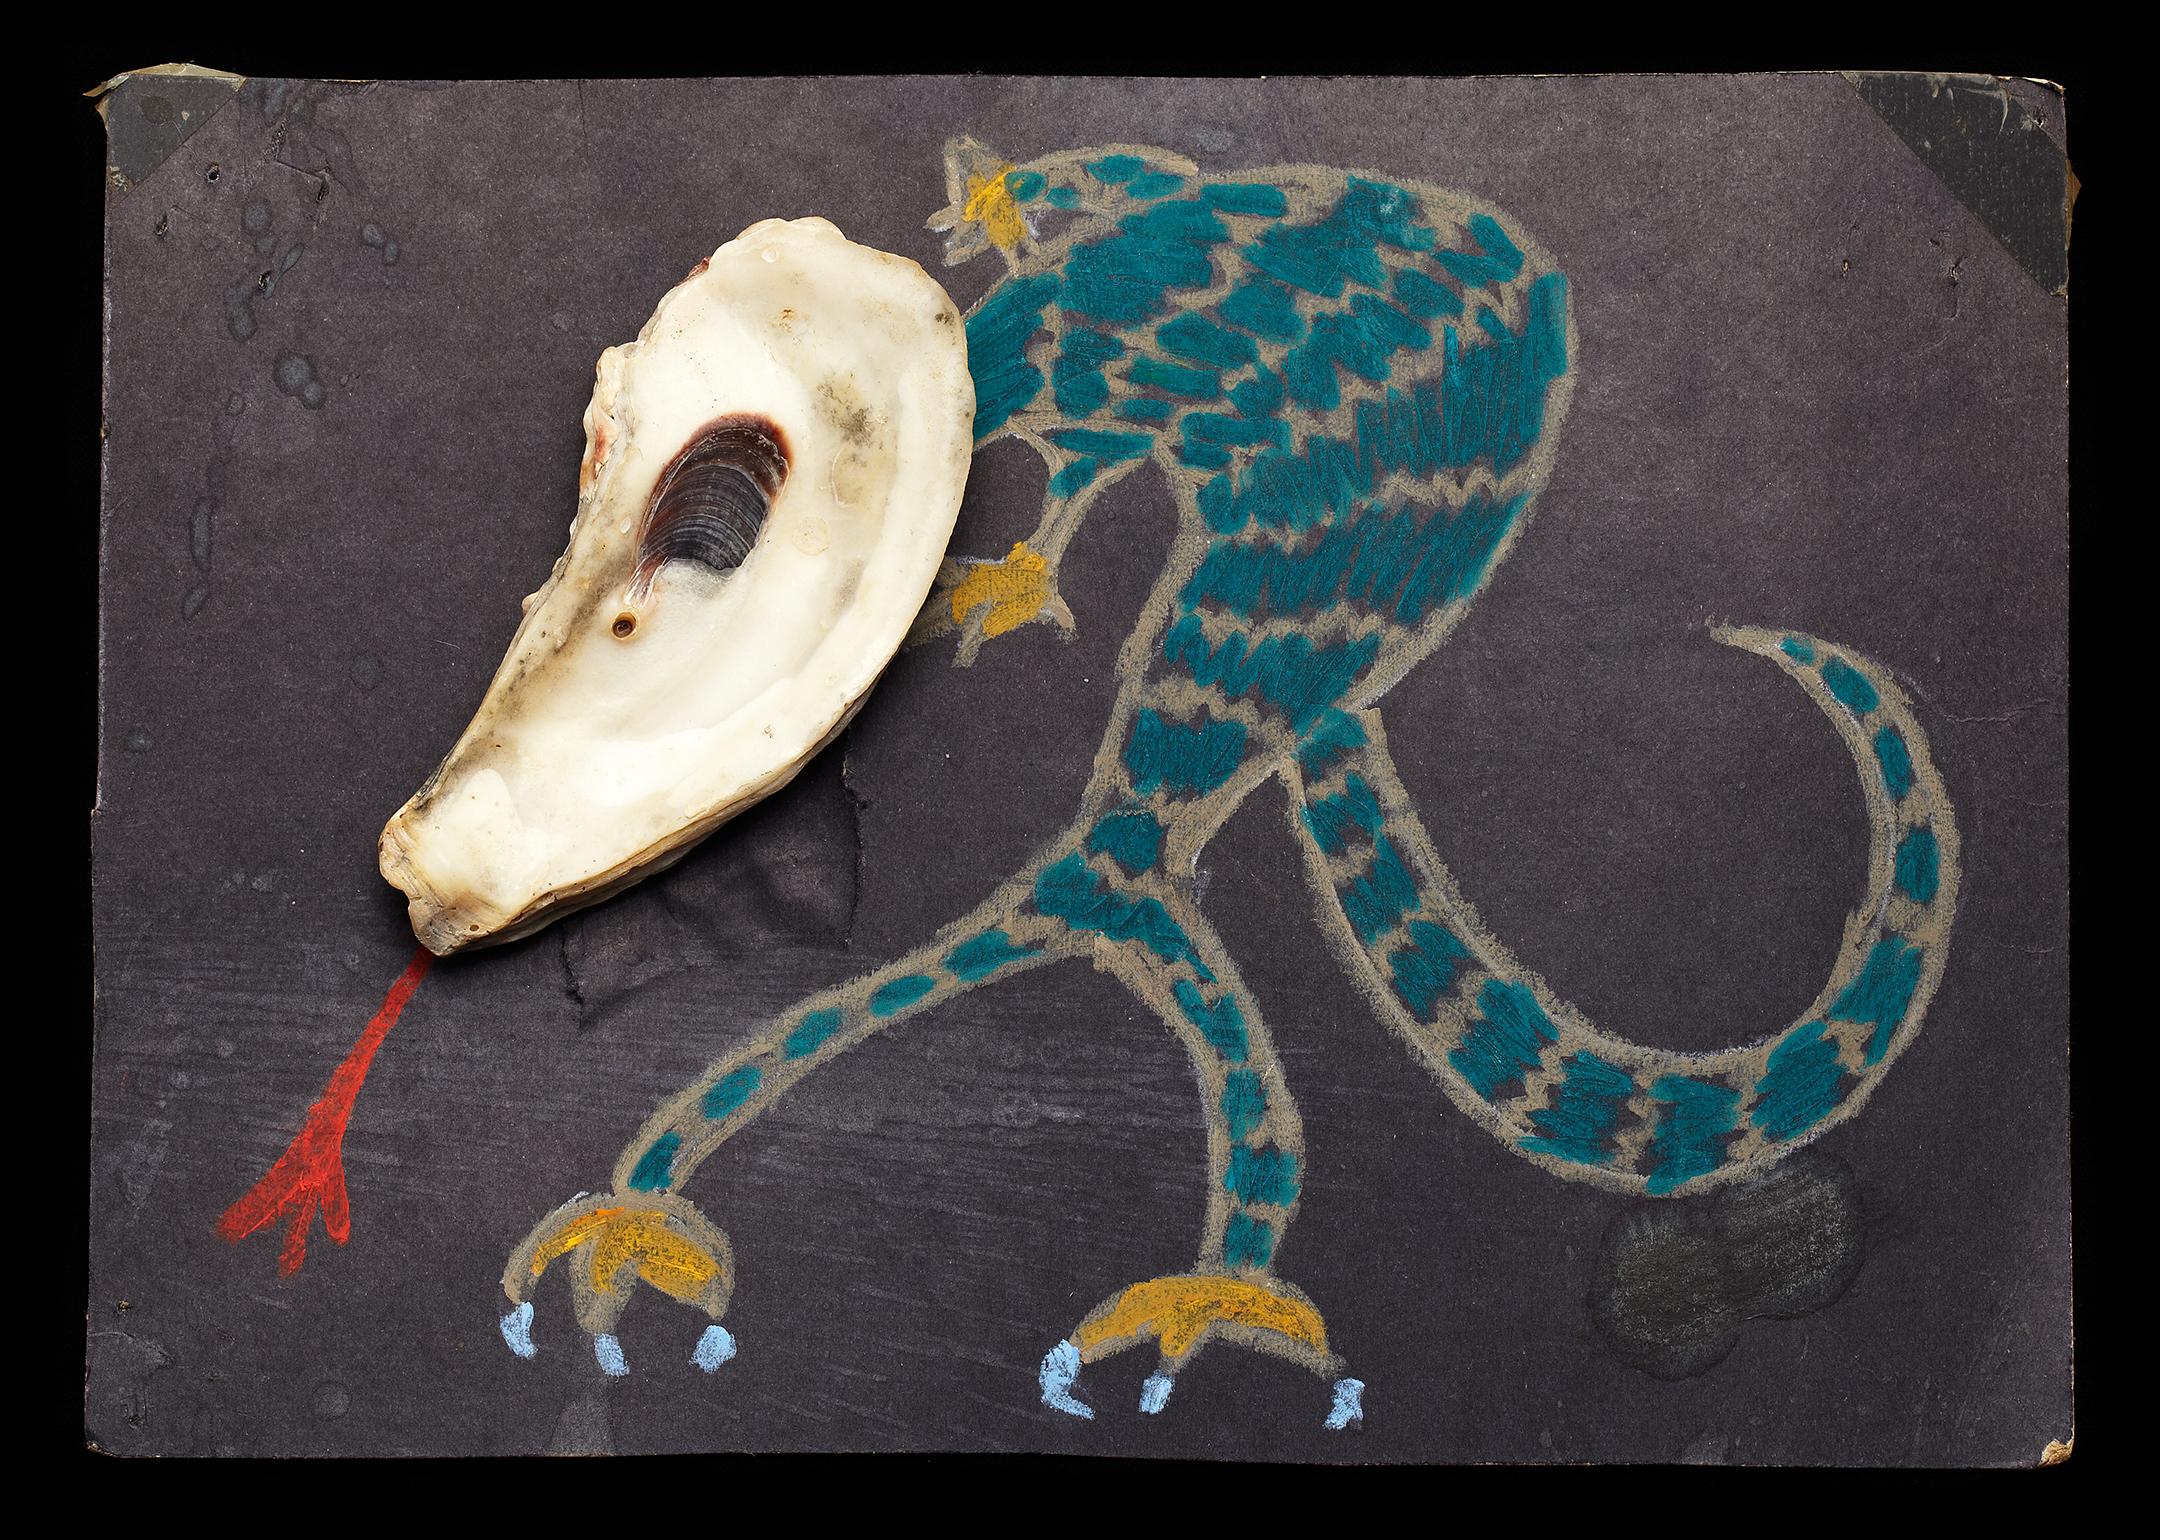 ShellArt-LizardMan by Thomas Wilson Laney